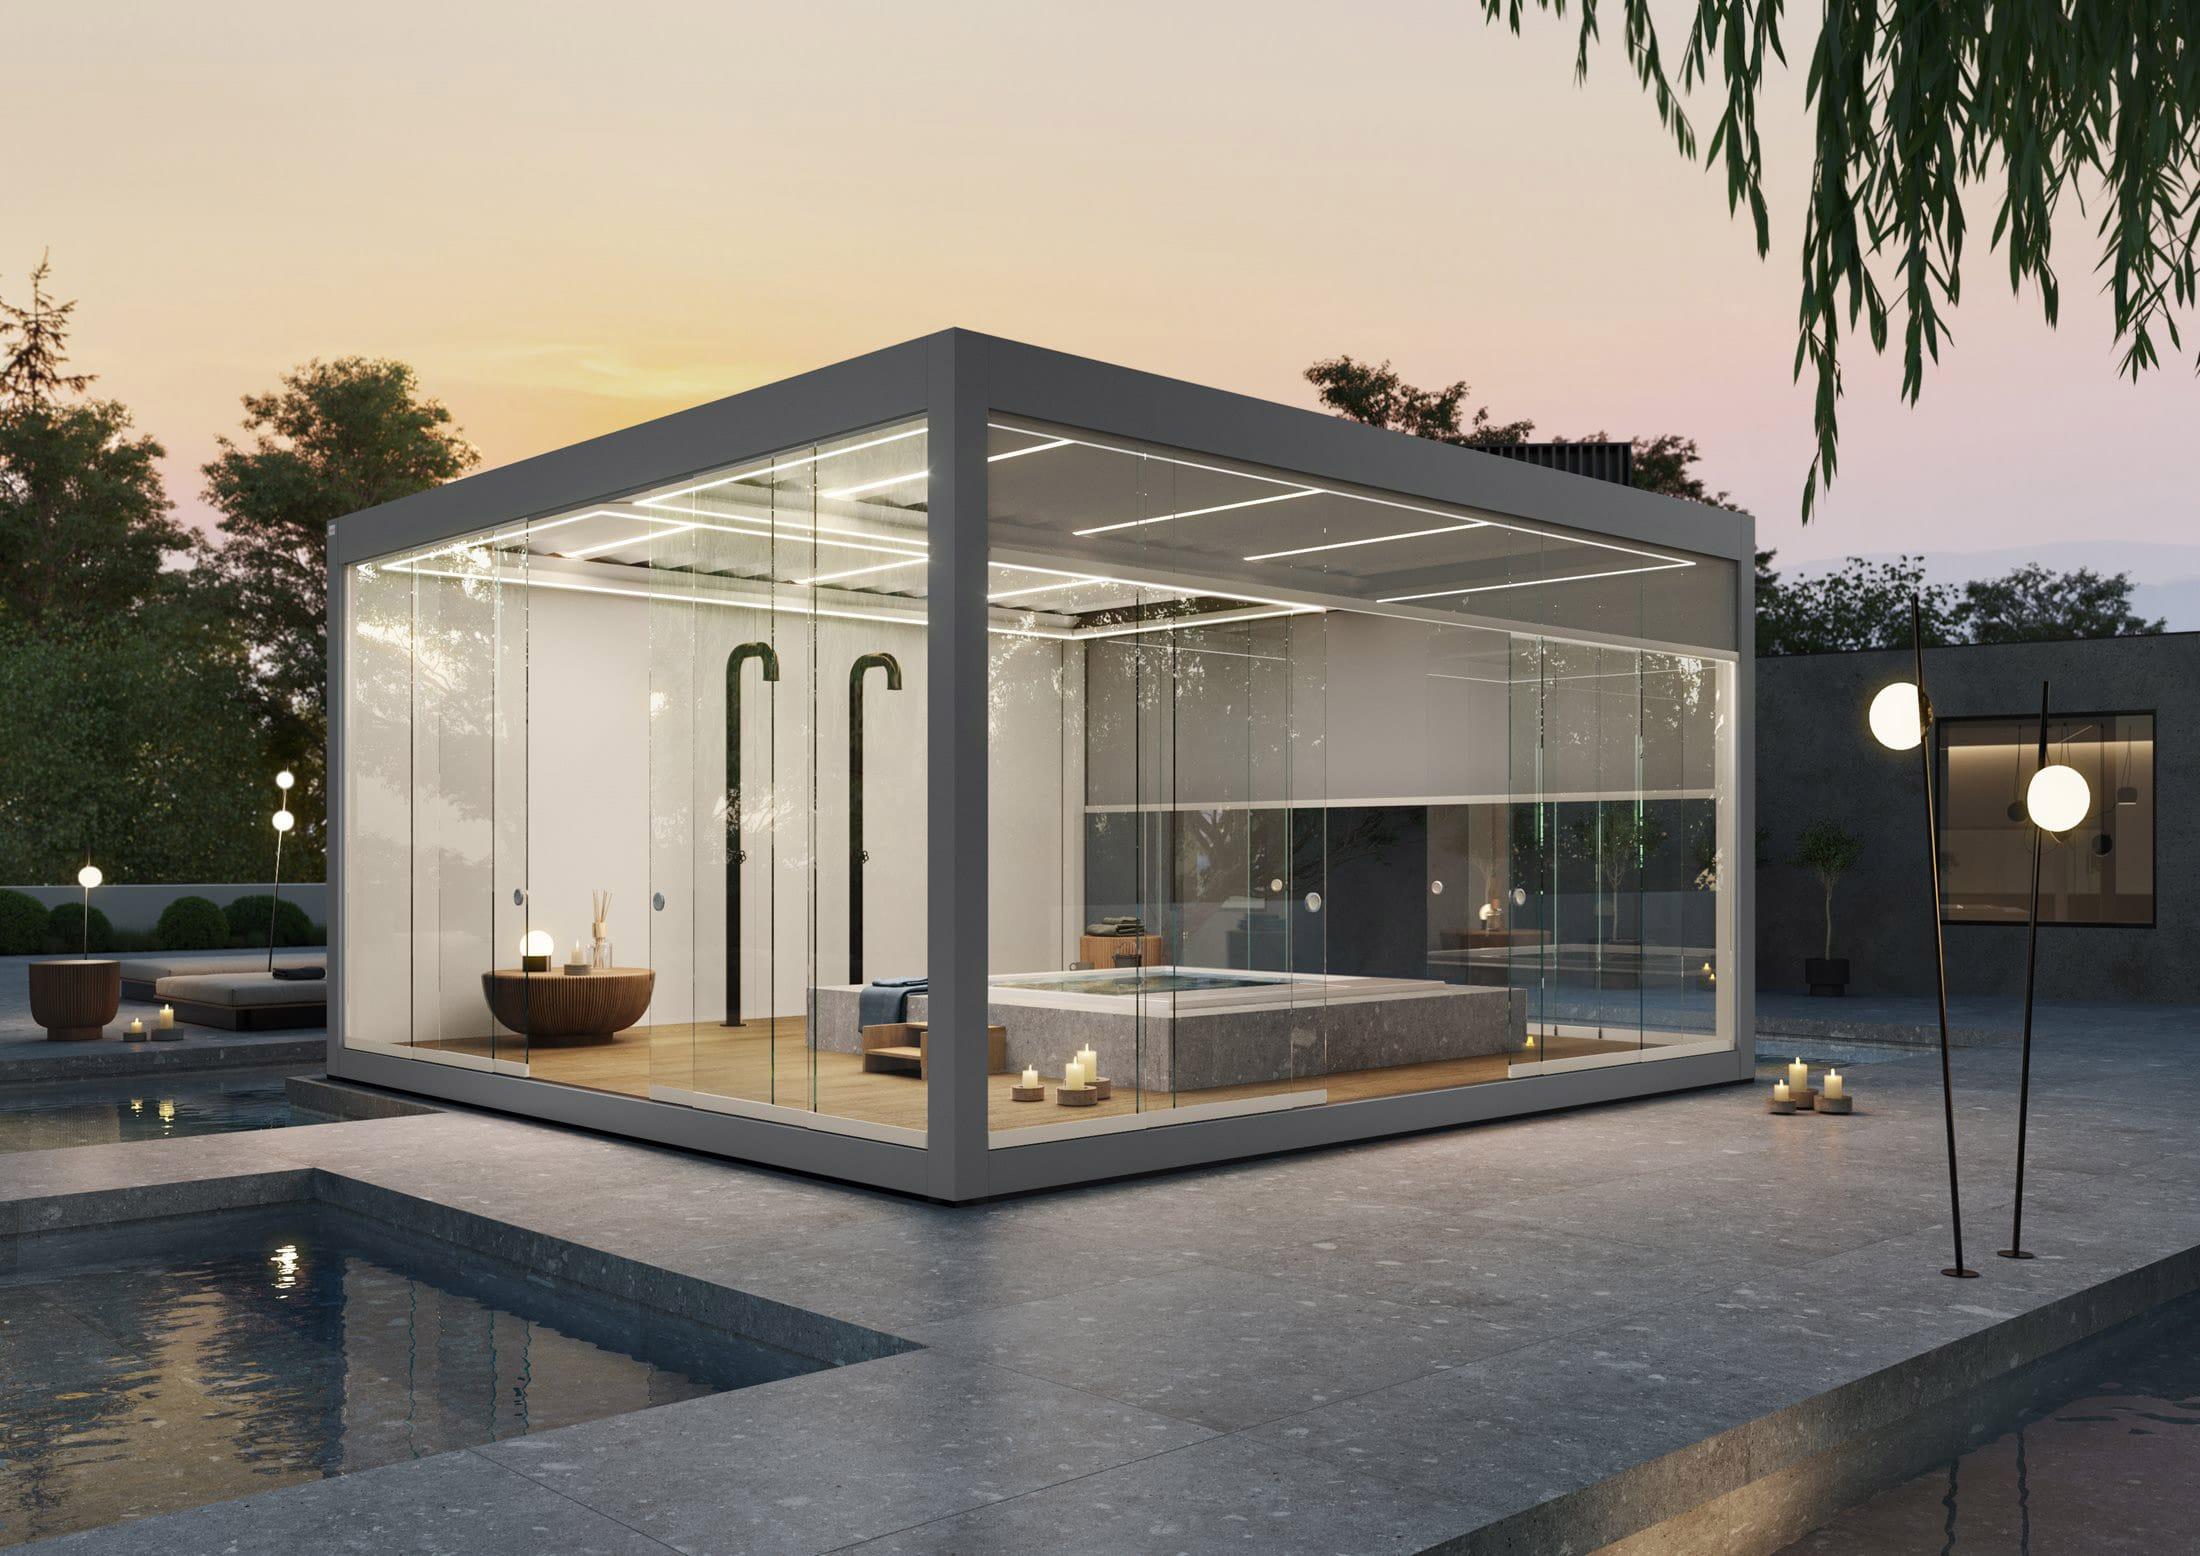 Bioclimatics Imago Pergola als Spa-Bereich auf der Terrasse